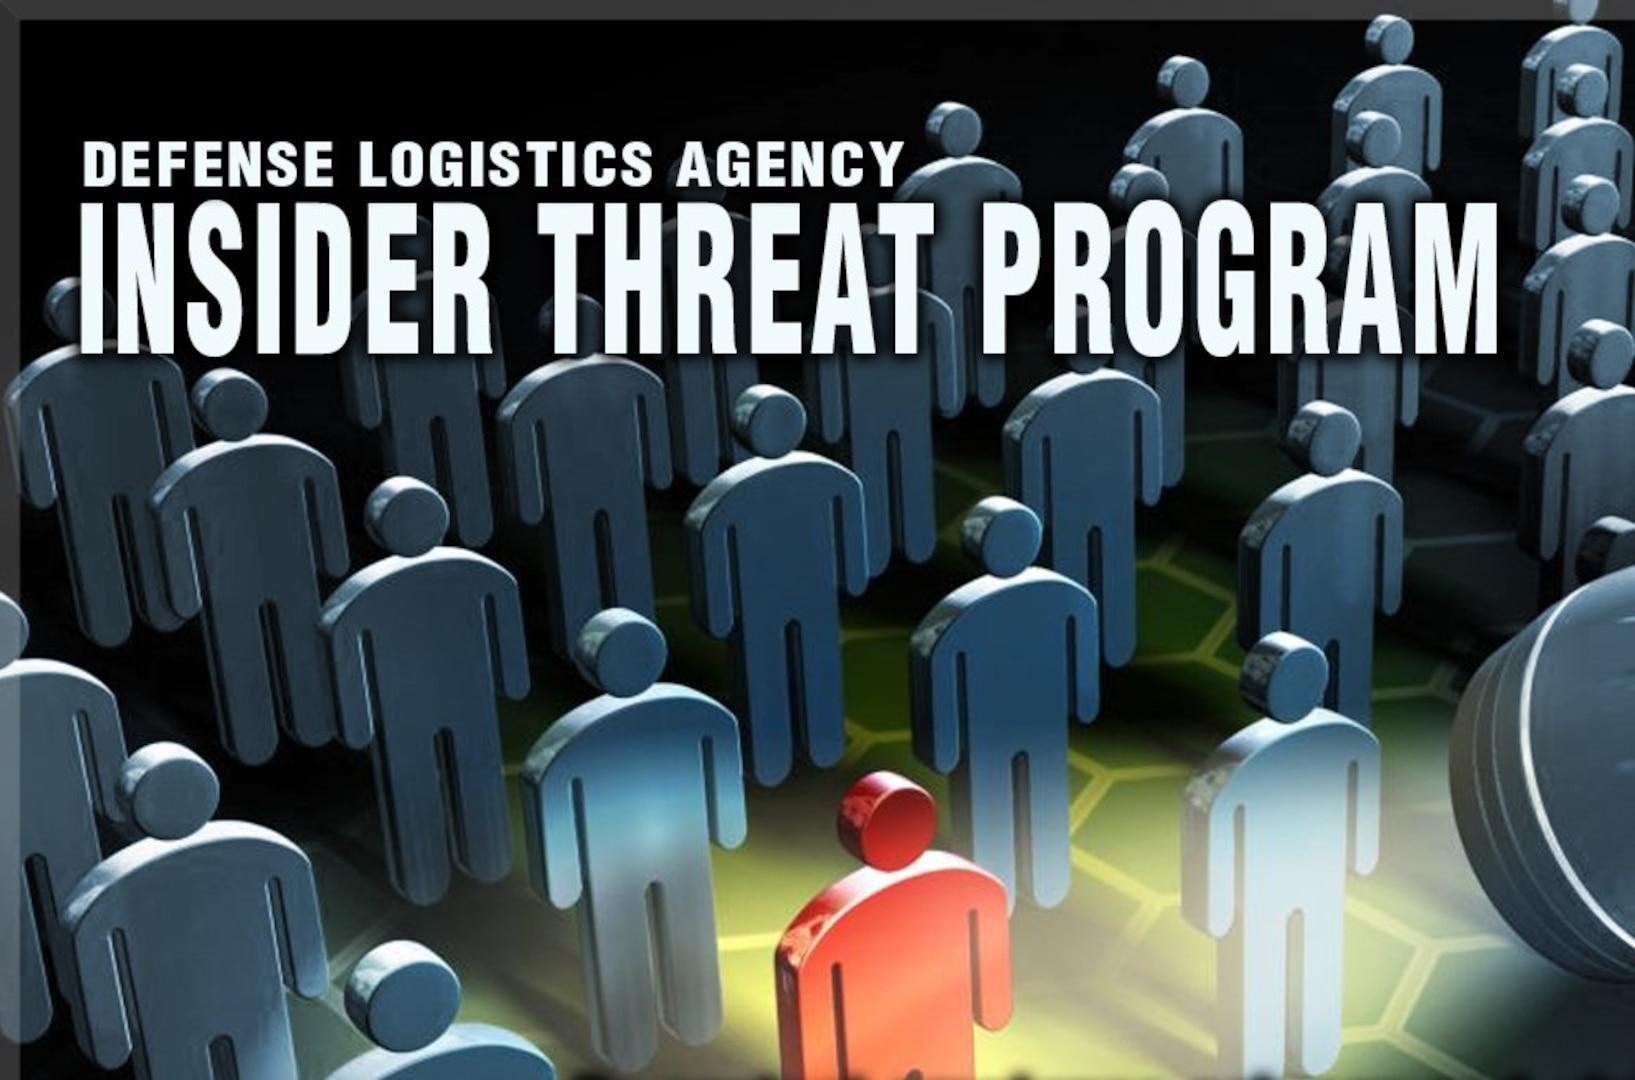 DLA Insider Threat Program graphic.